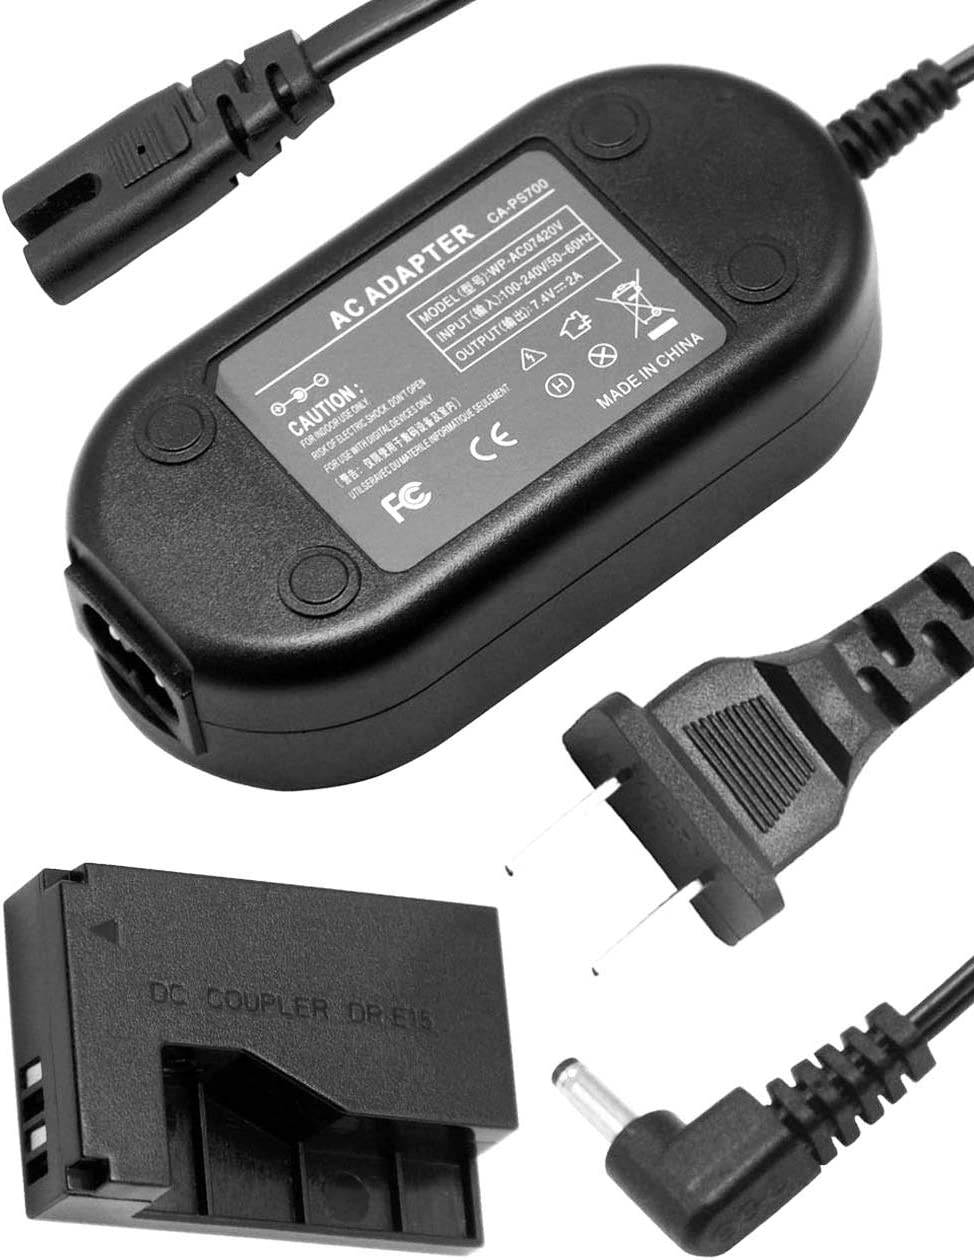 HQRP AC Power Adapter for Canon ACK-E15 EOS Rebel SL1 eos Kiss X7 eos 100D